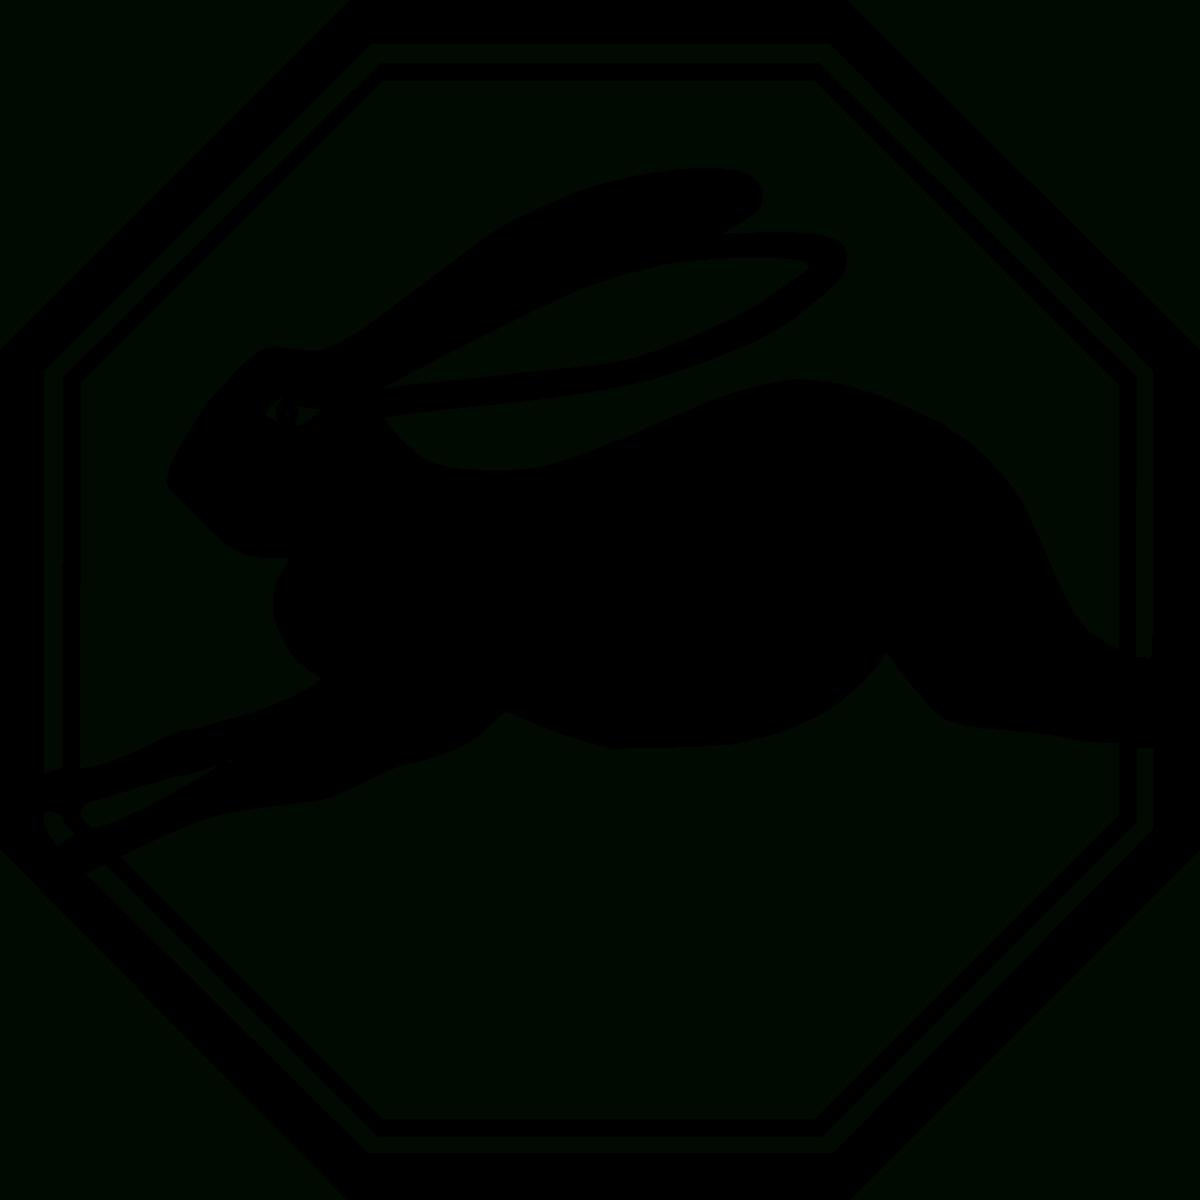 Rabbit (Zodiac) - Wikipedia pertaining to Zodiac For Birth Year 1951